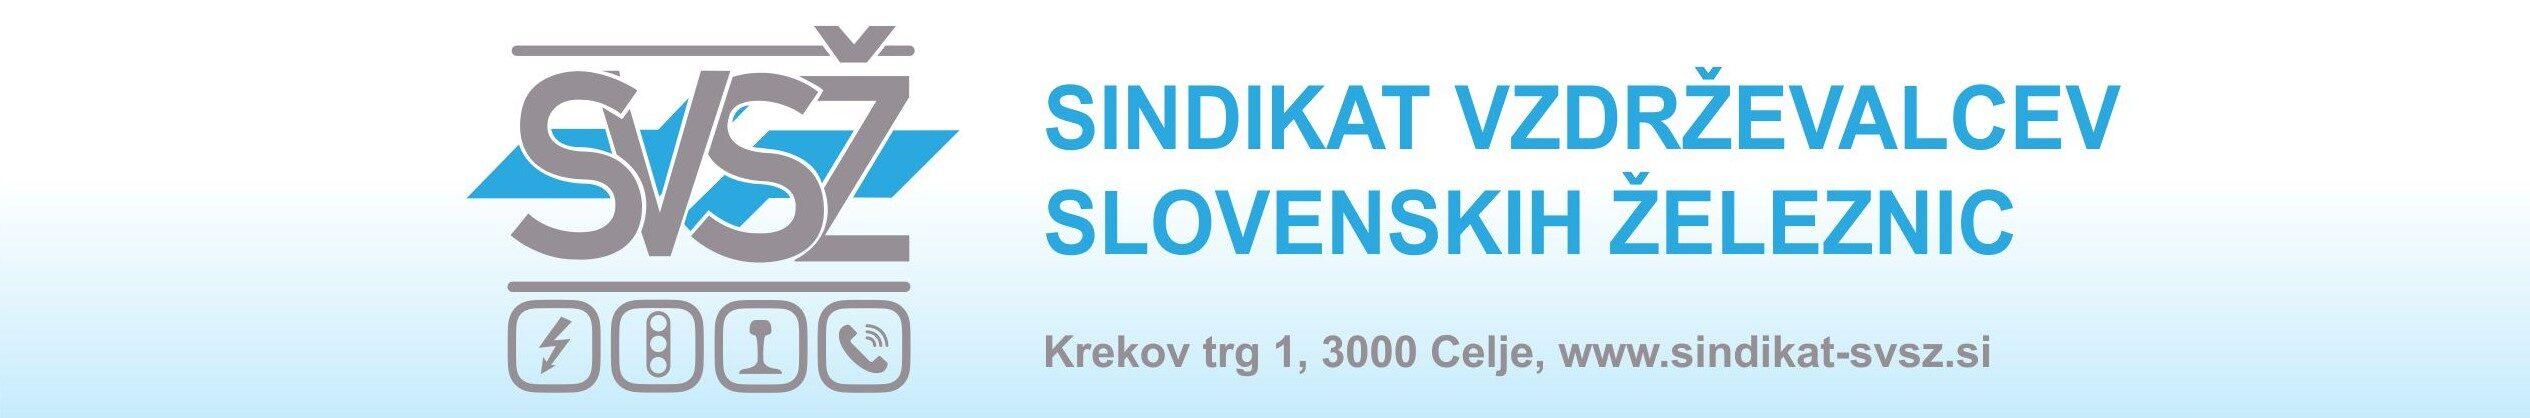 Sindikat vzdrževalcev Slovenskih železnic